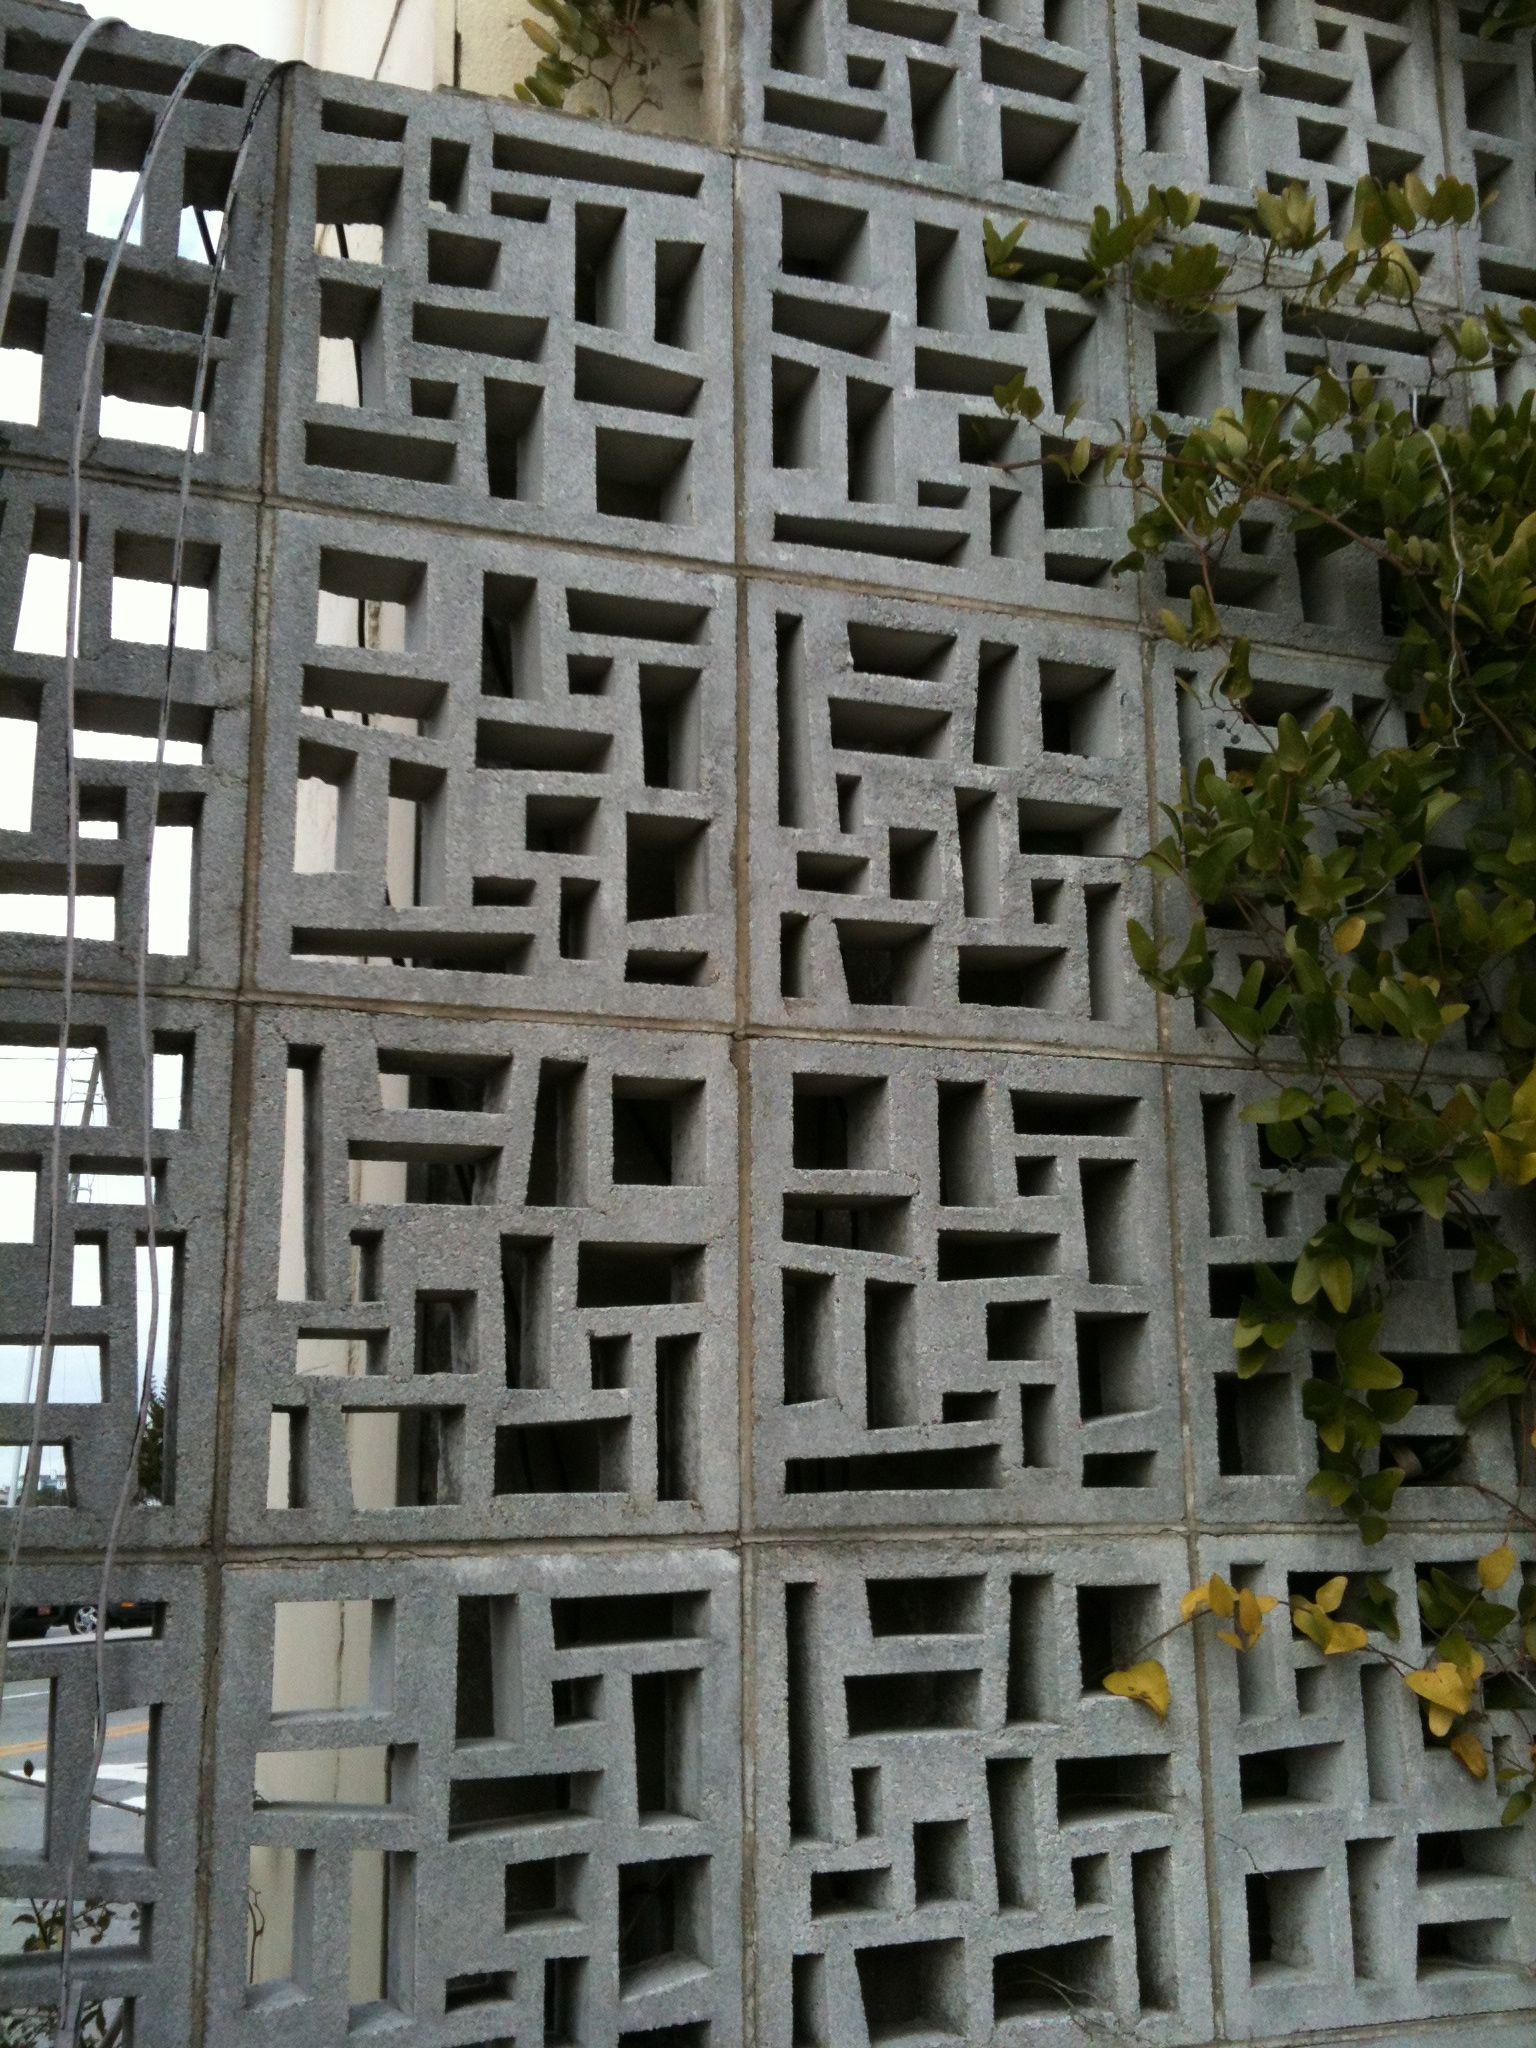 Cool Concrete Blocks Www Bontool Com Breeze Block Wall Decorative Concrete Blocks Breeze Blocks